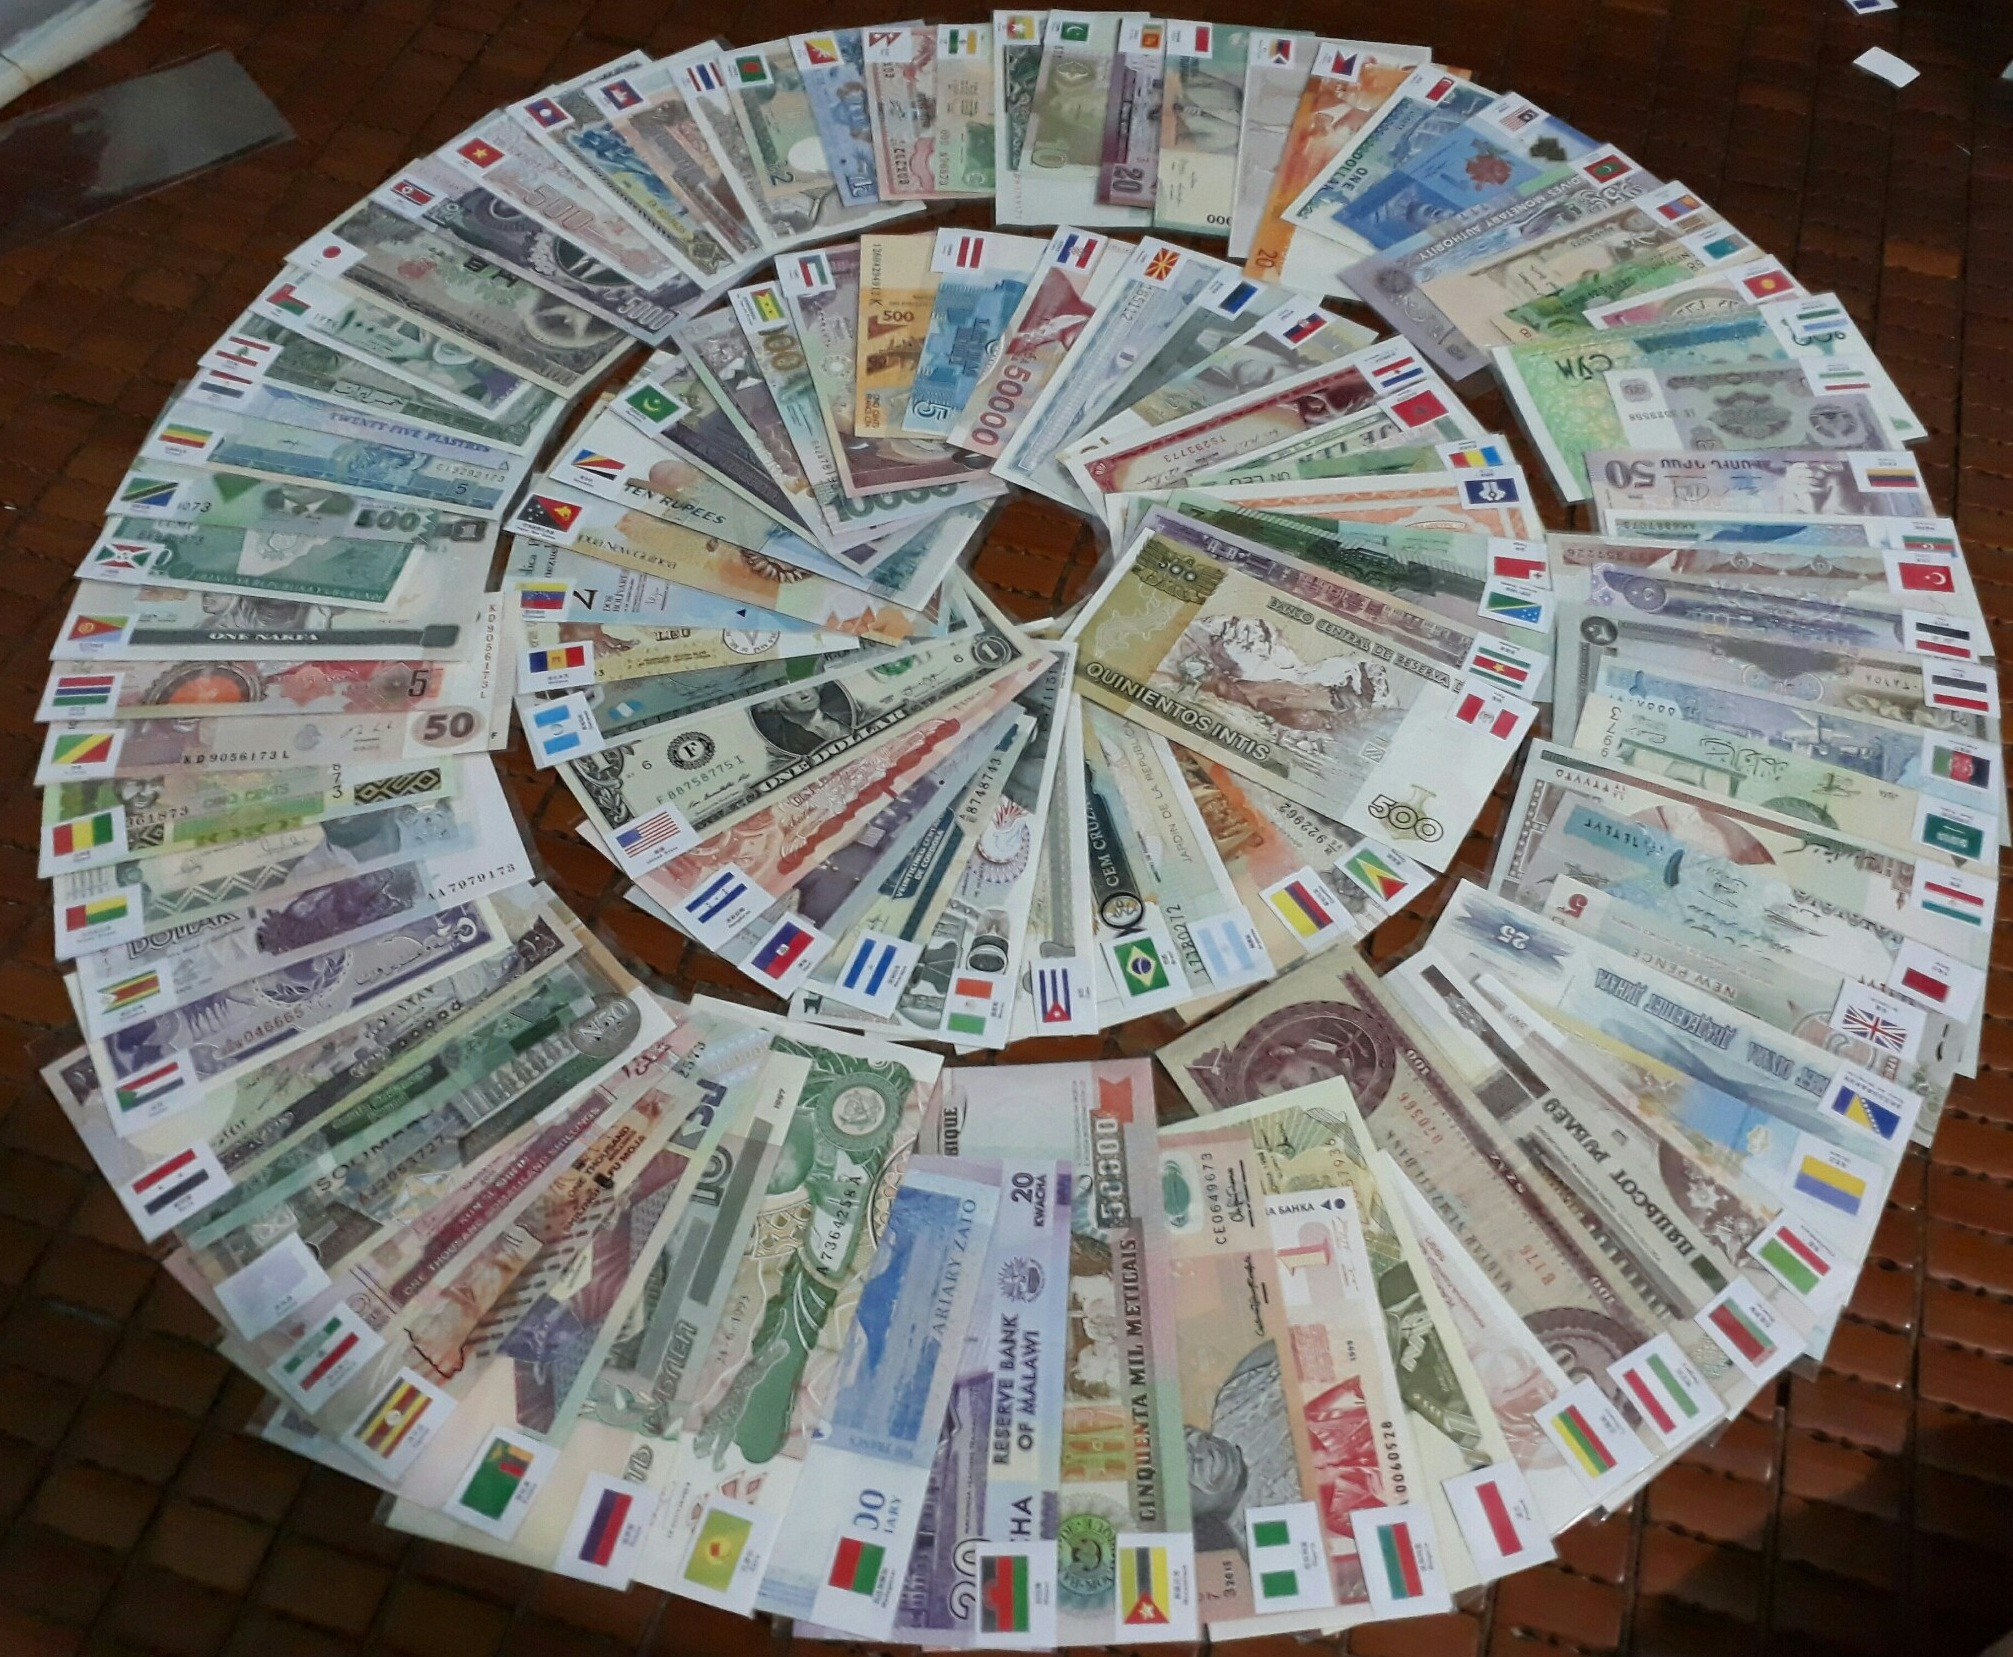 Bộ Tiền Thế Giới 100 Quốc Gia